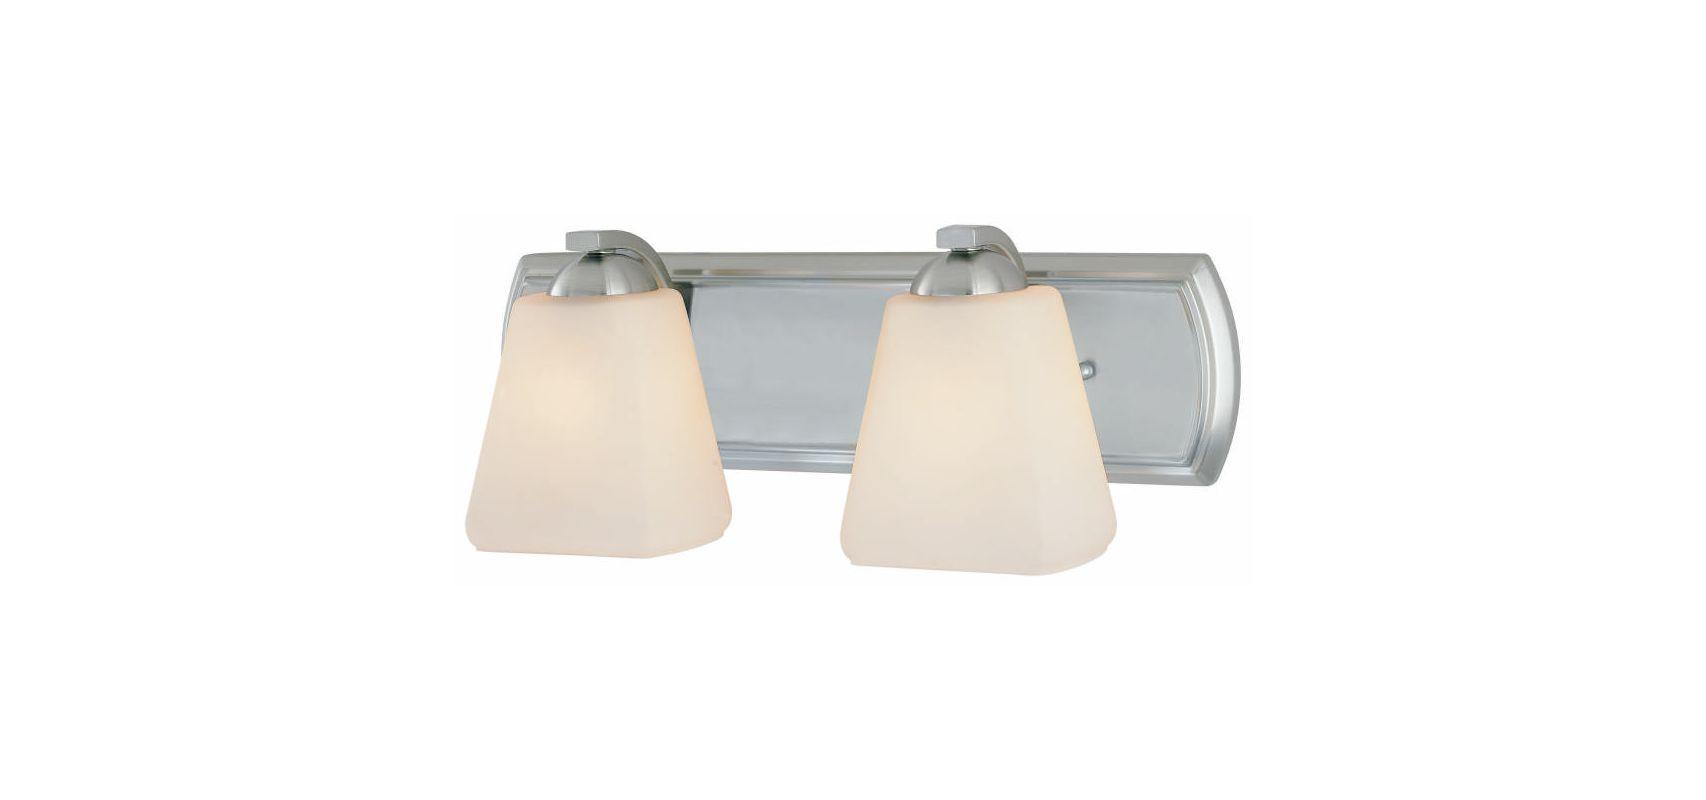 Dolan Designs 3372 Hammond 2 Light Bathroom Fixture Satin Nickel